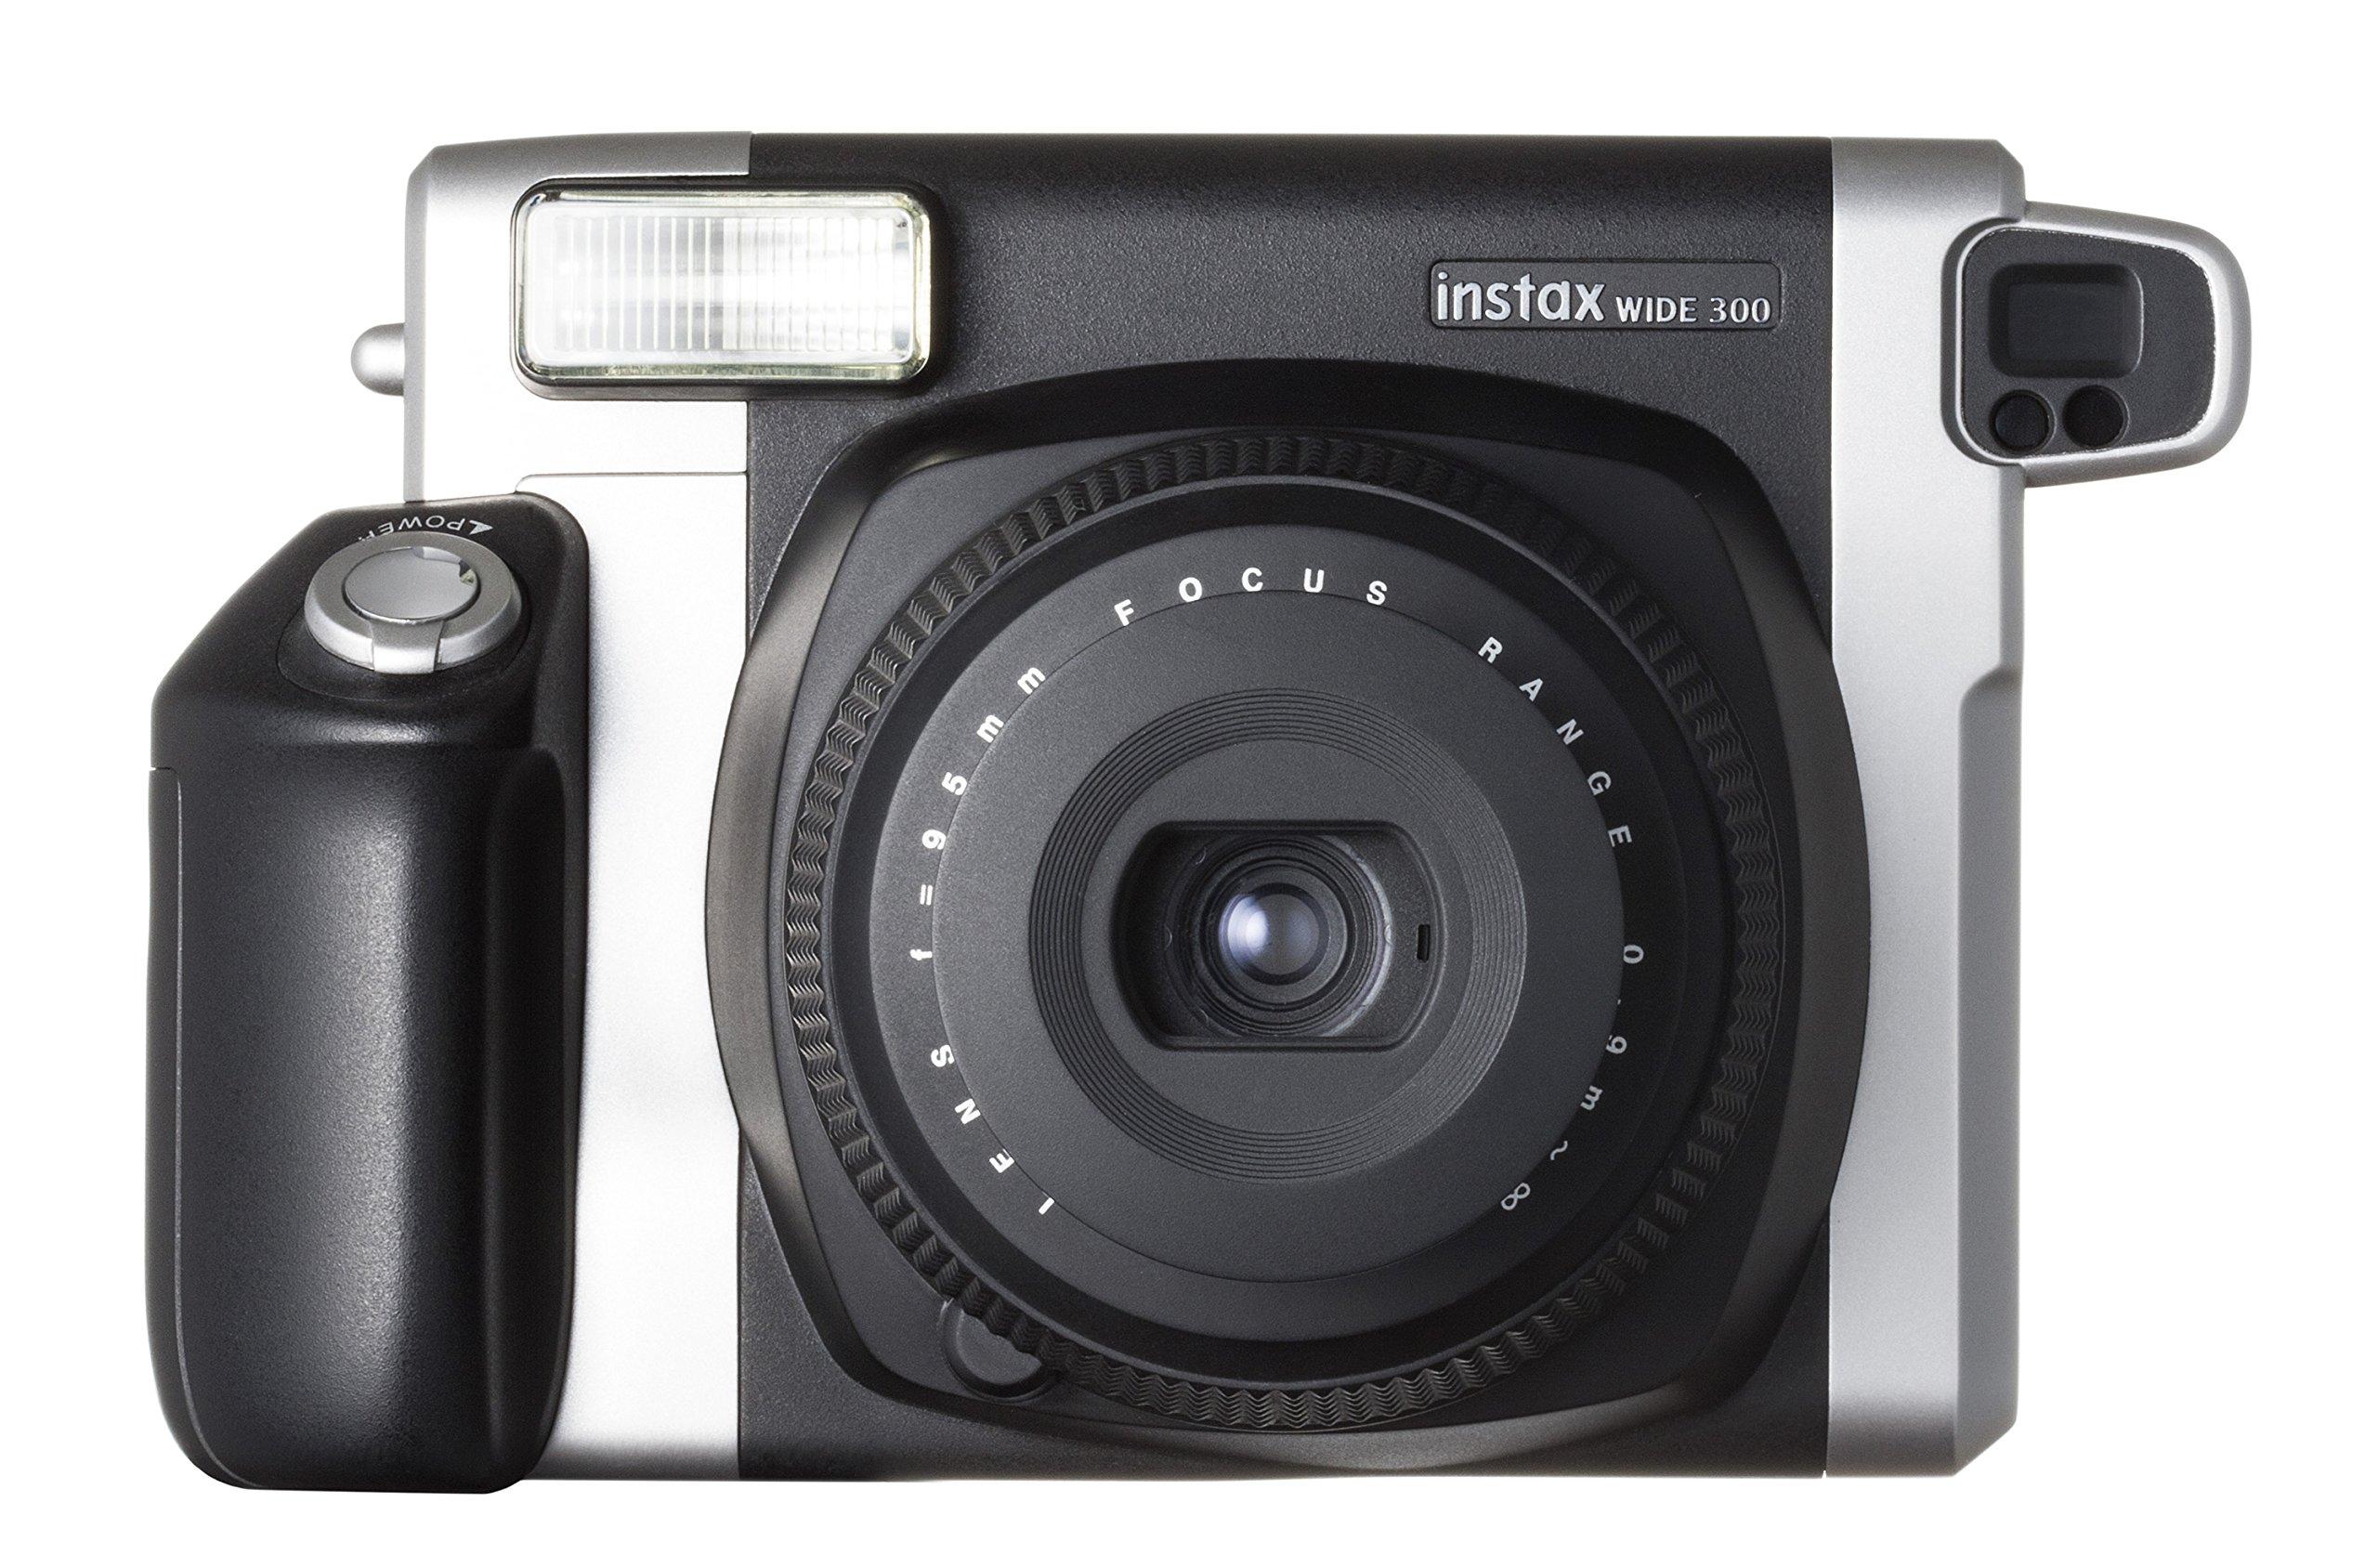 Fujifilm Instax Wide 300 Instant Film Camera (Black) by Fujifilm